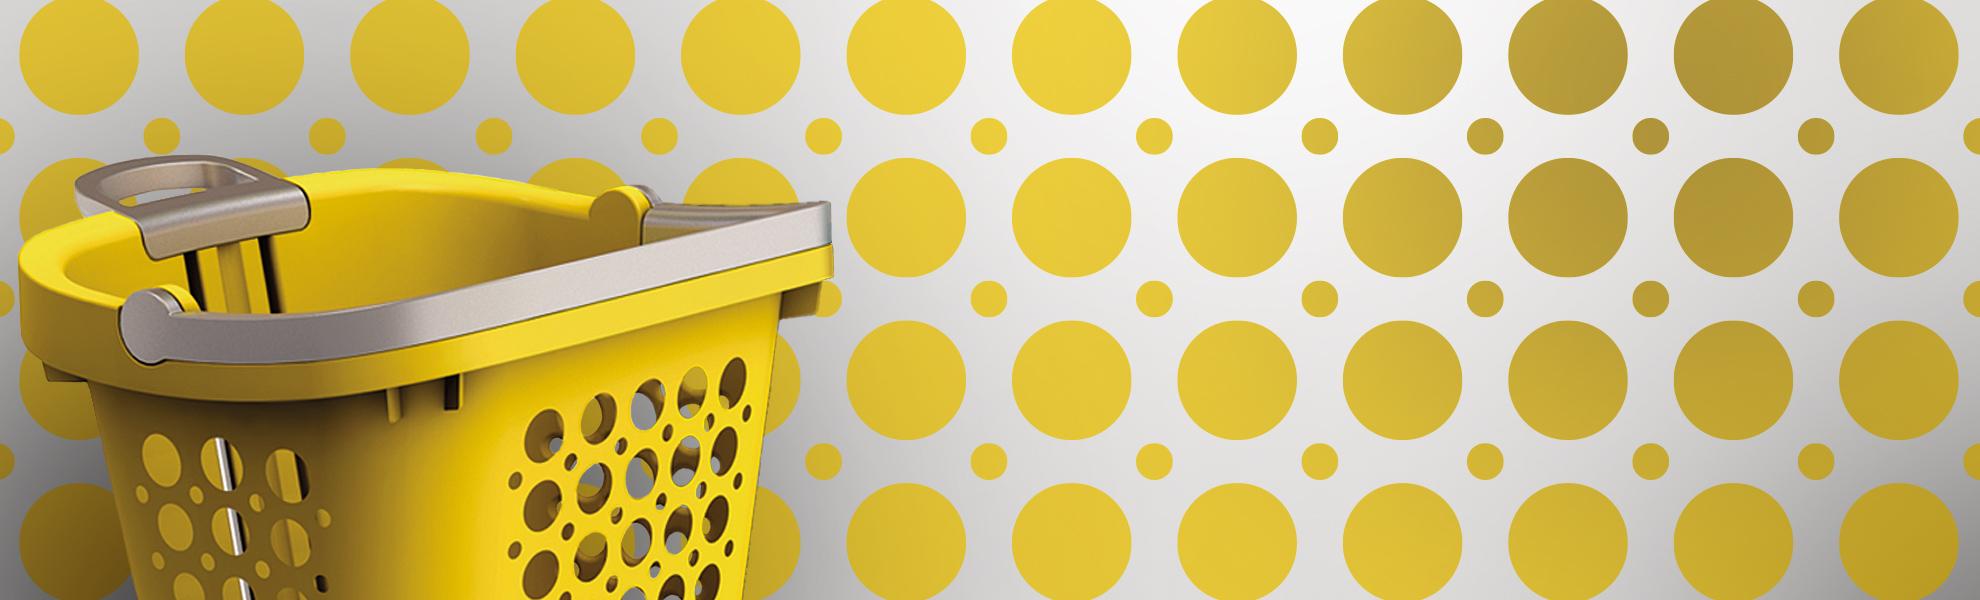 chelles-e-hayashi-design-portfolio-pnaples-smarkt-structural-product-language-identity-graphic